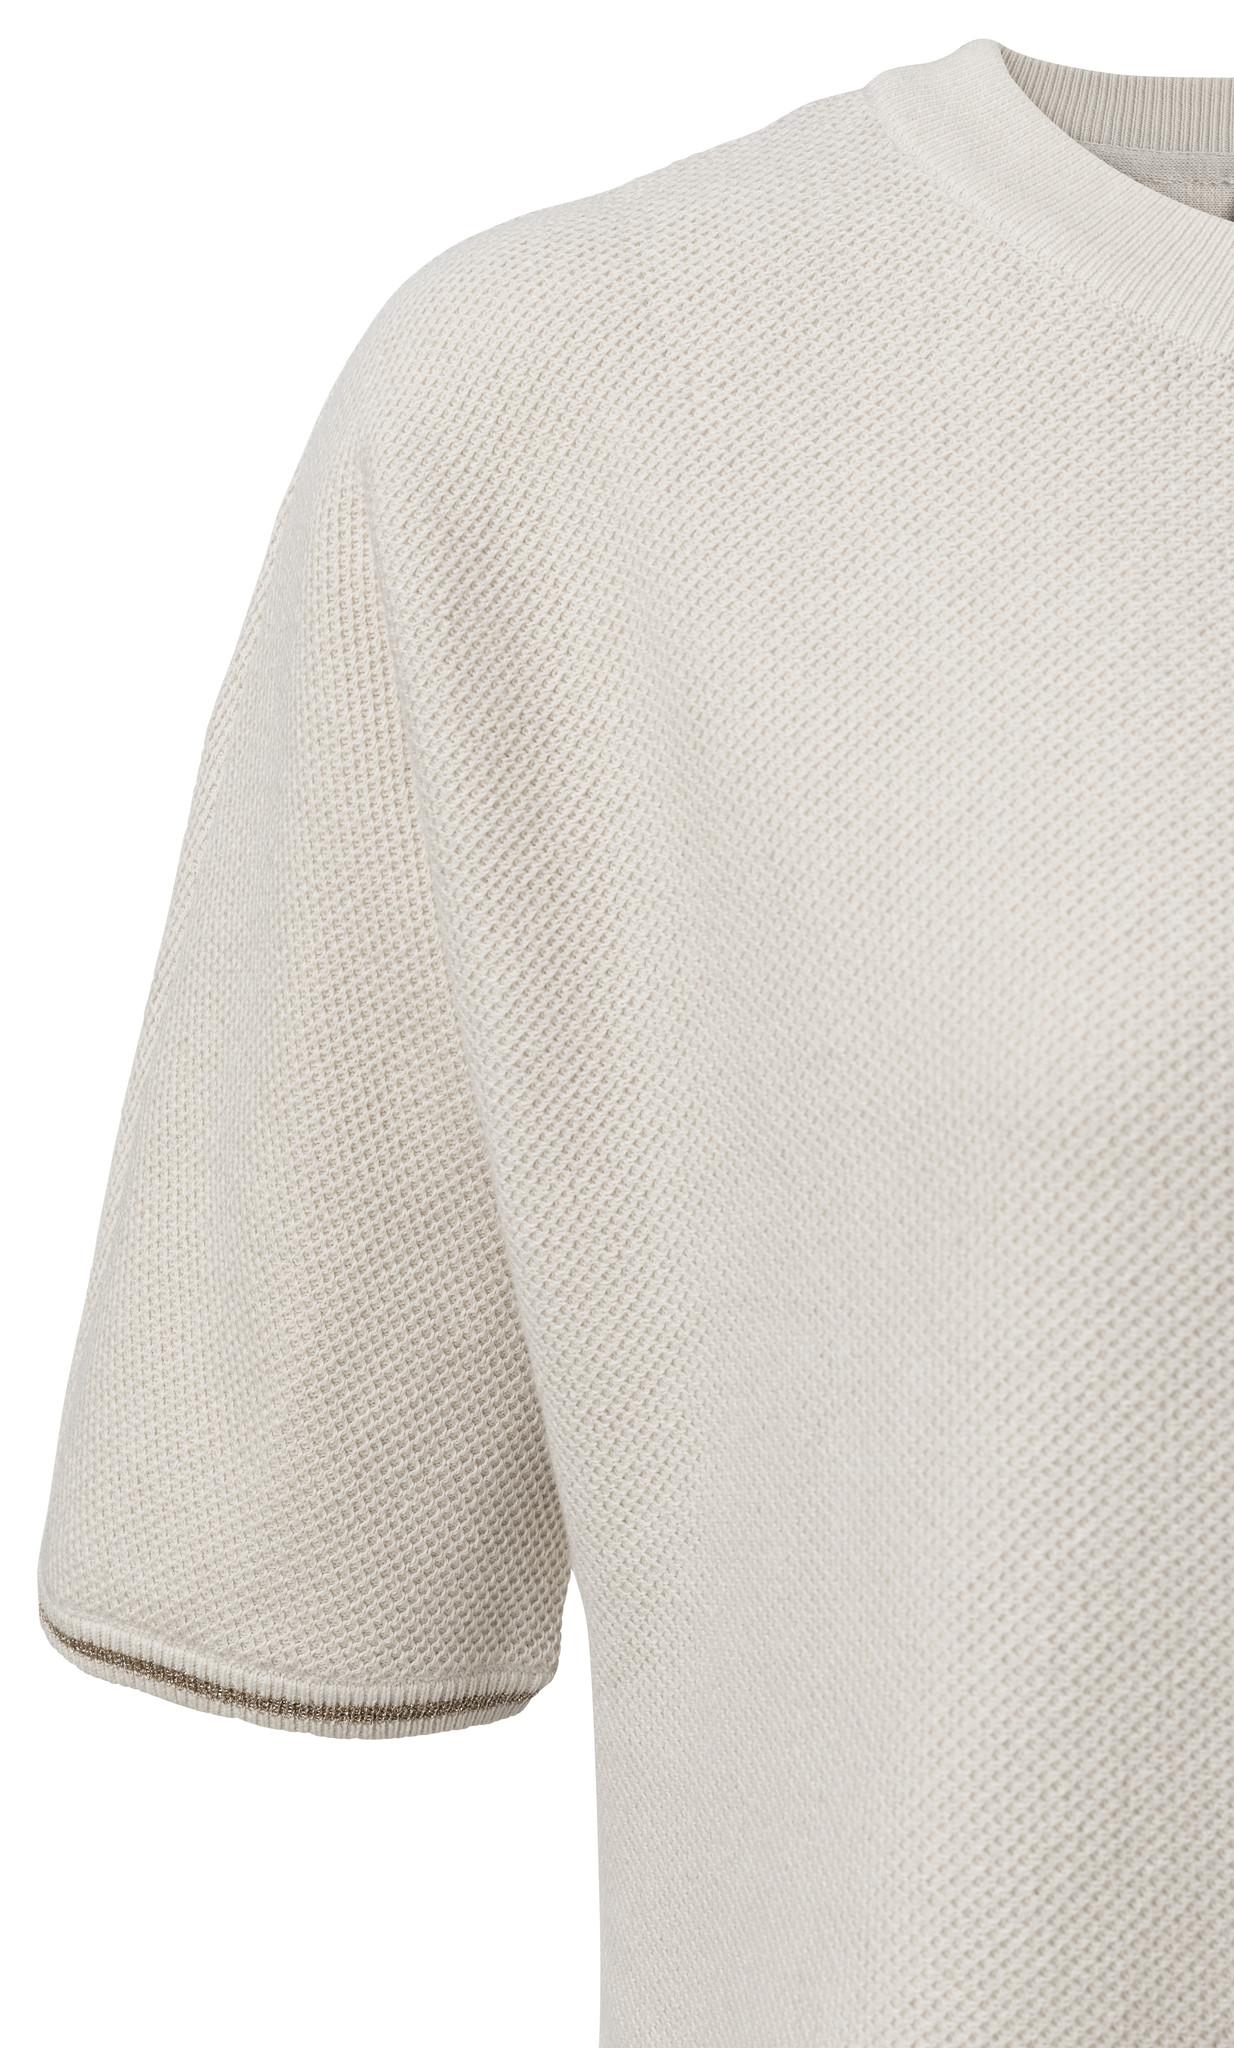 yaya Sweater with lurex r 1000286-014-2